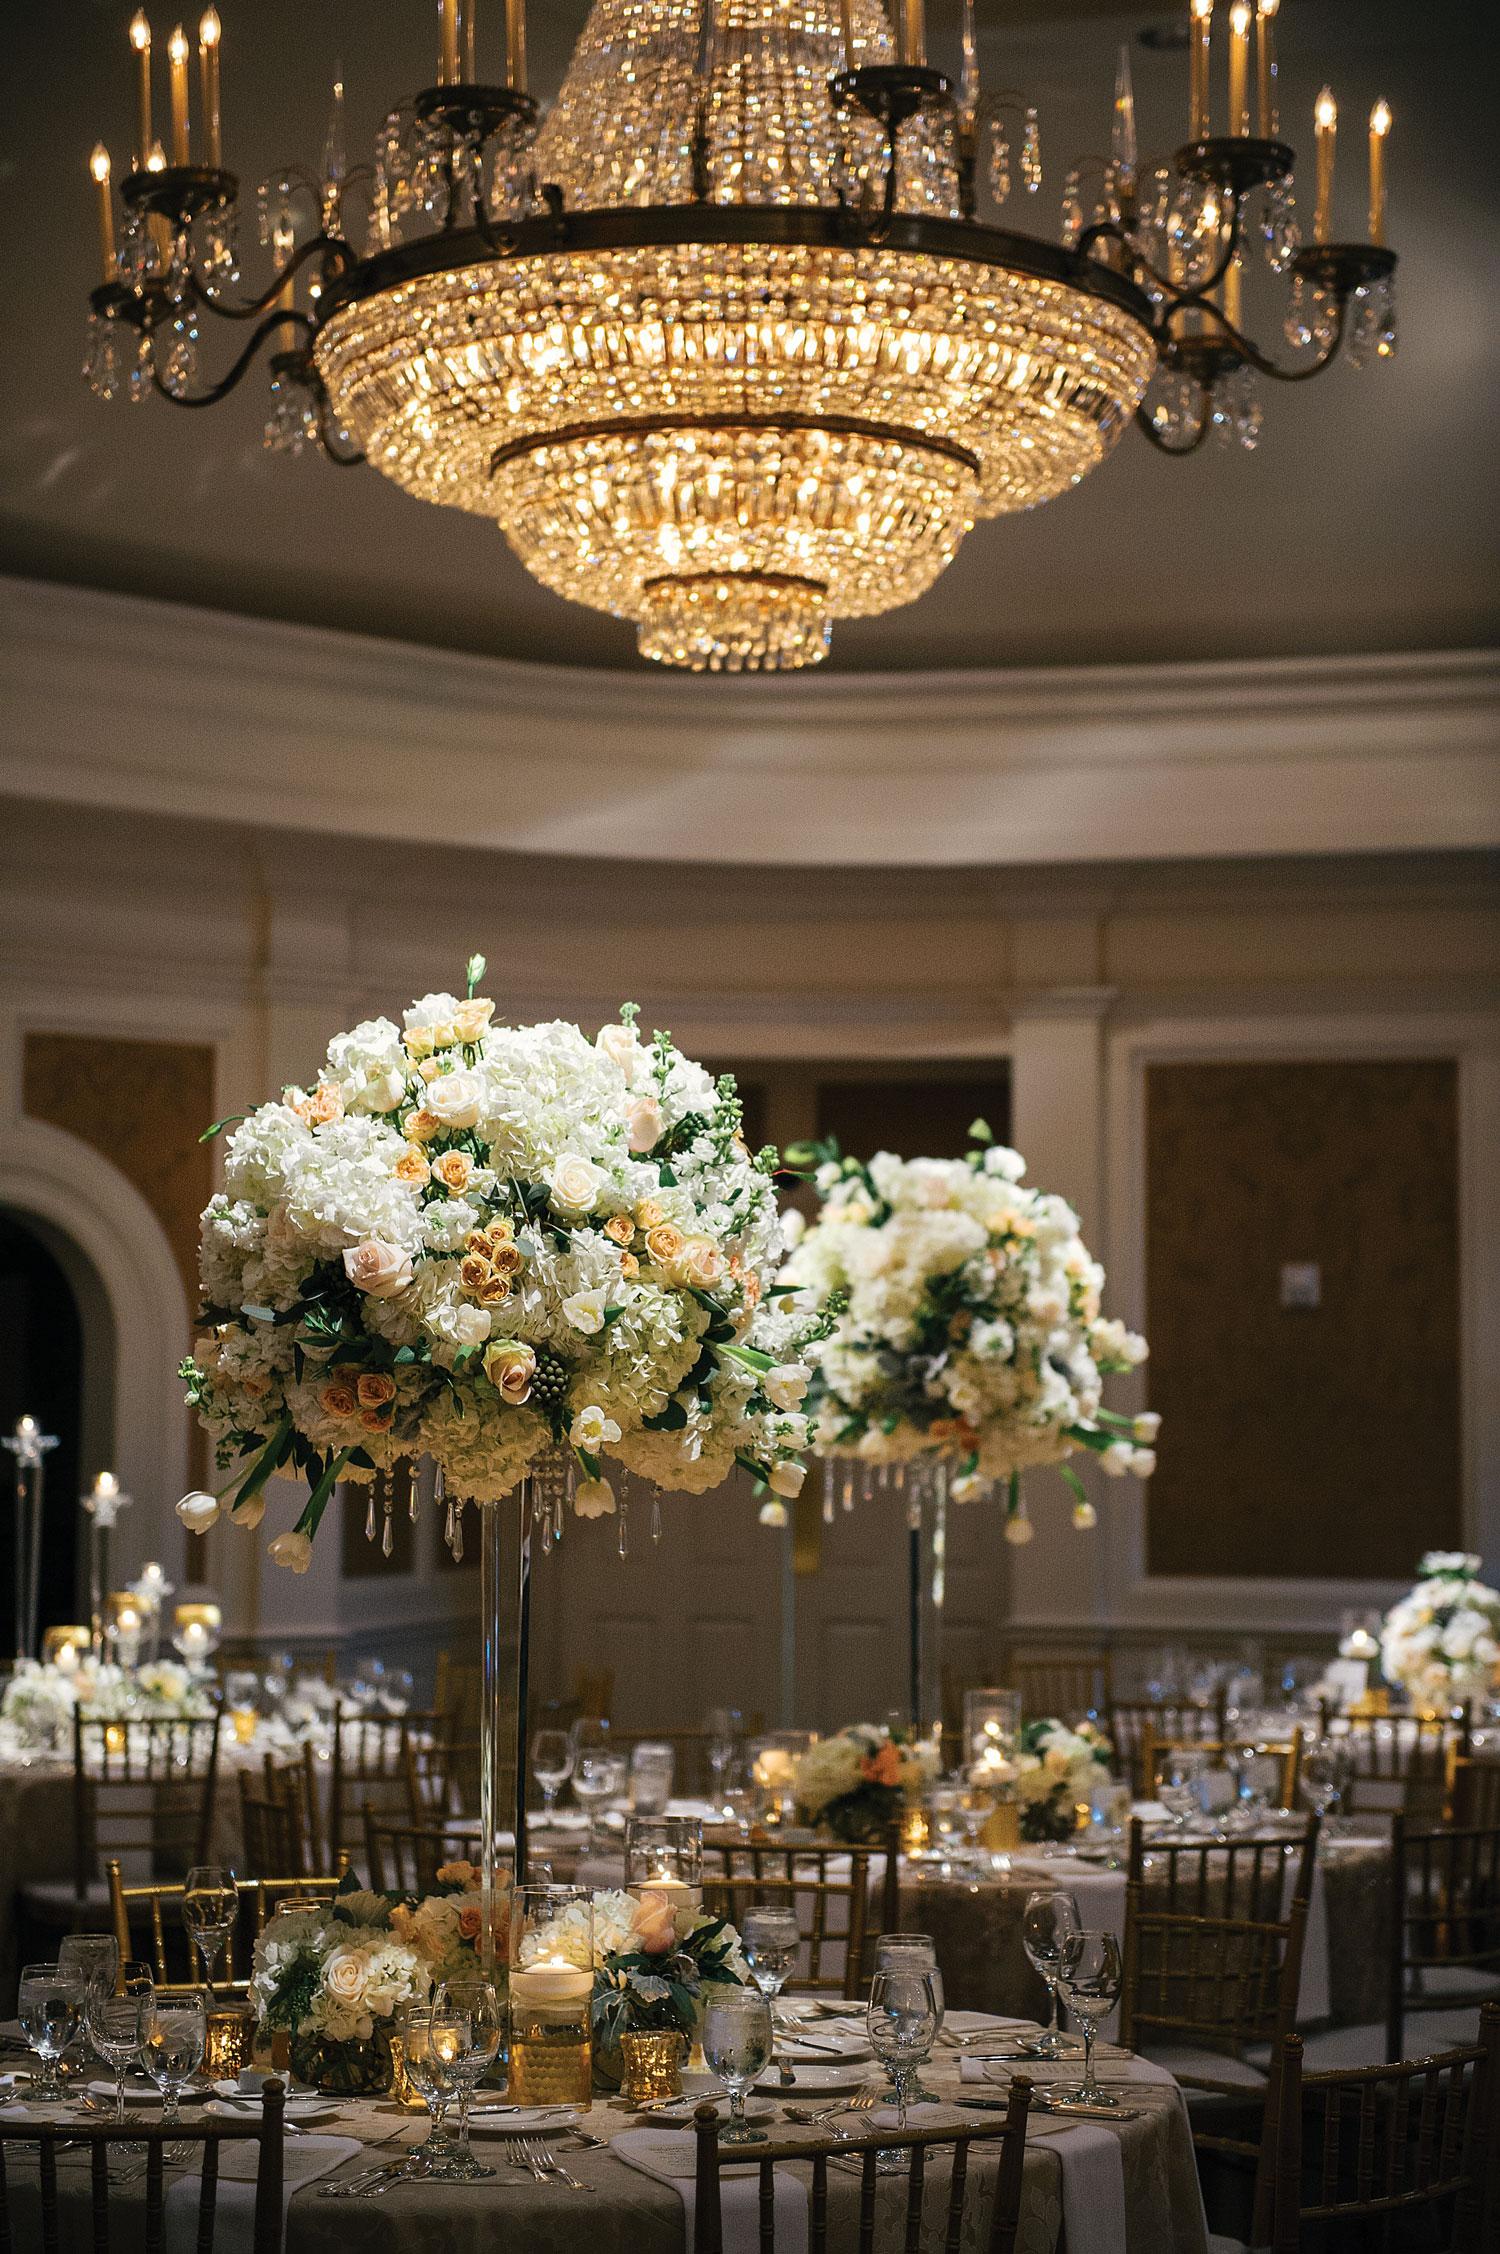 Inside Weddings winter 2018 issue preview real weddings wedding ideas classic wedding decor